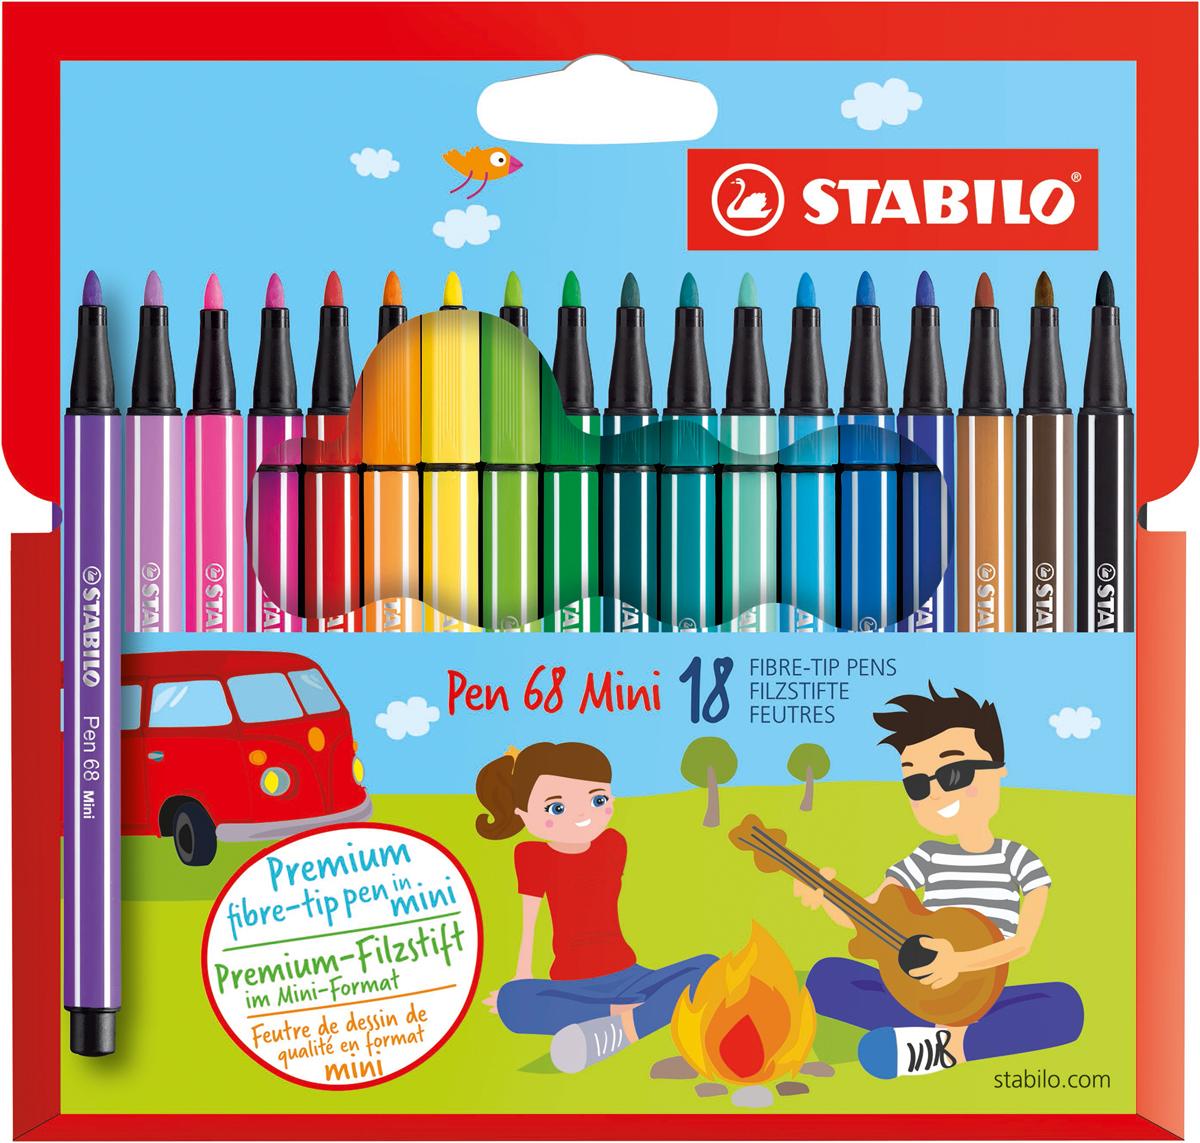 STABILO Набор фломастеров Pen 68 Mini 18 цветов stabilo набор фломастеров pen 68 green editional 10 цветов